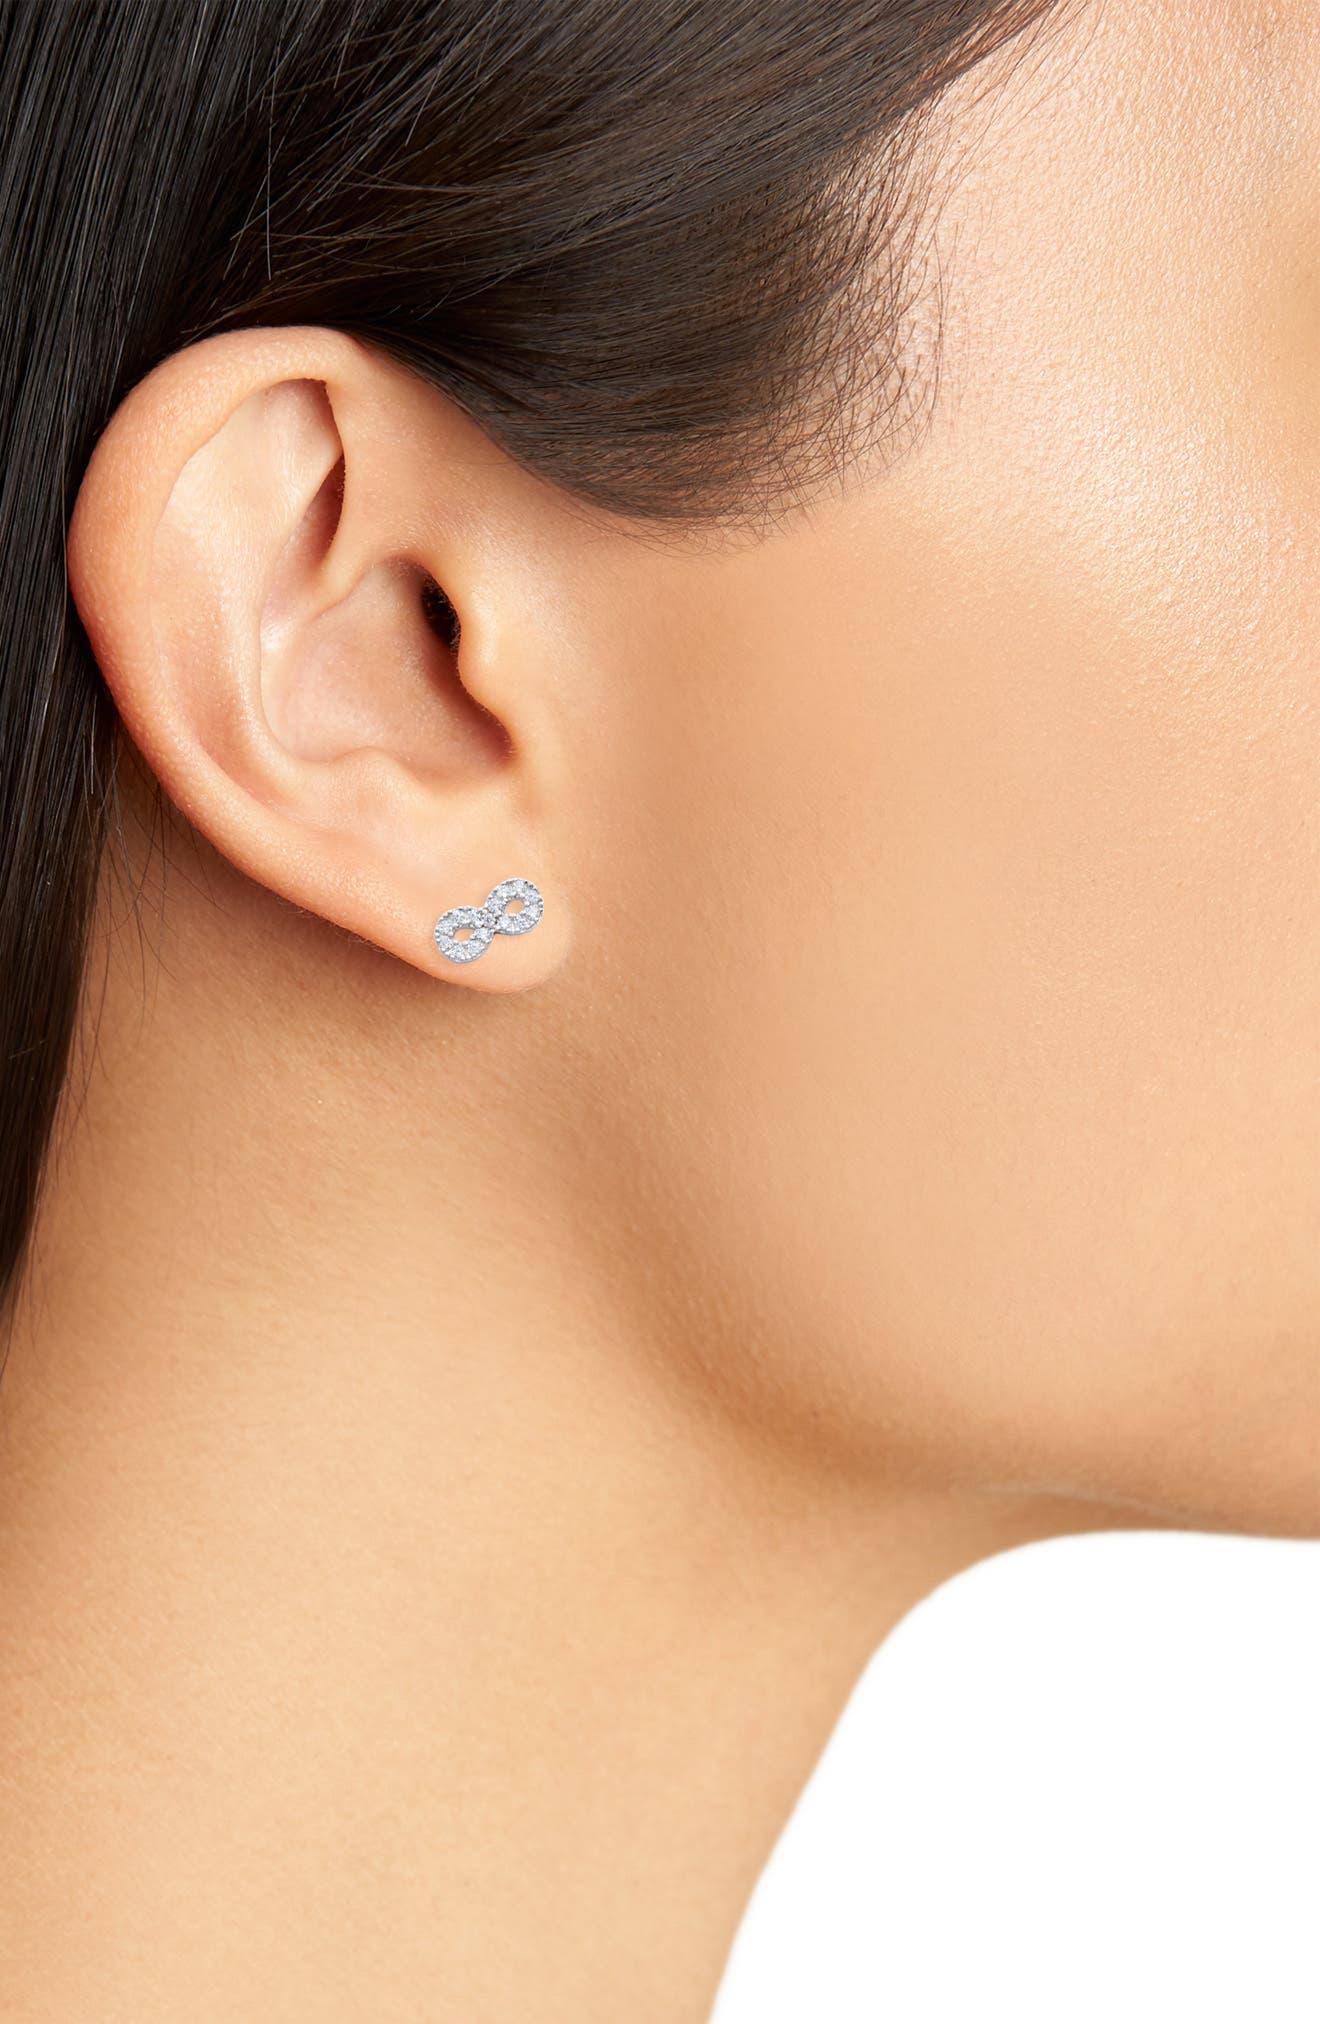 Infinity Stud Earrings,                             Alternate thumbnail 2, color,                             Platinum